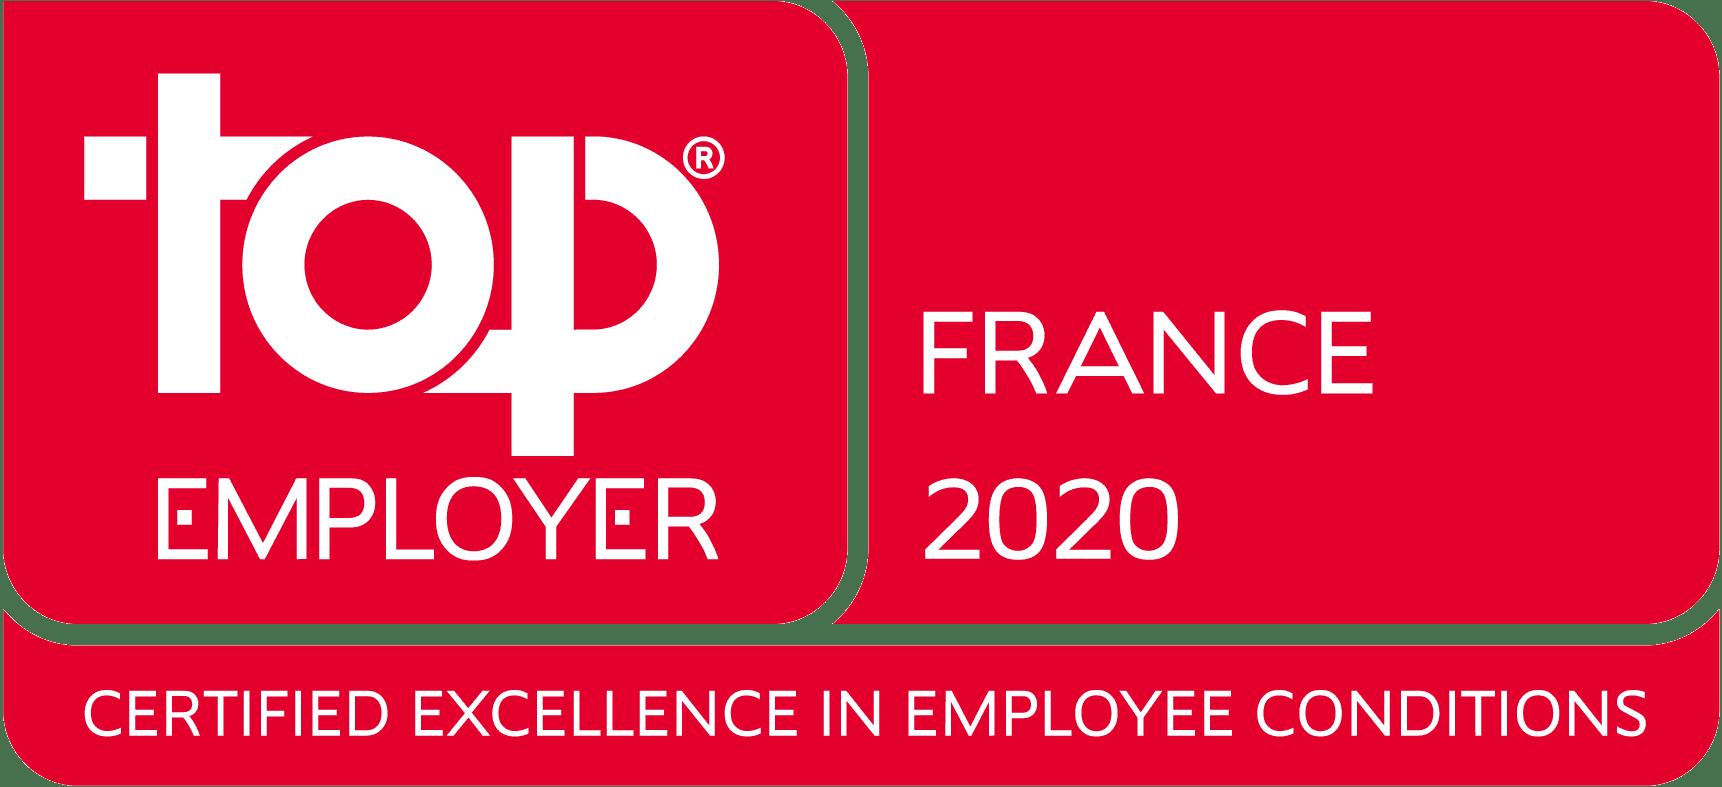 Top Employer France 2020 Logo